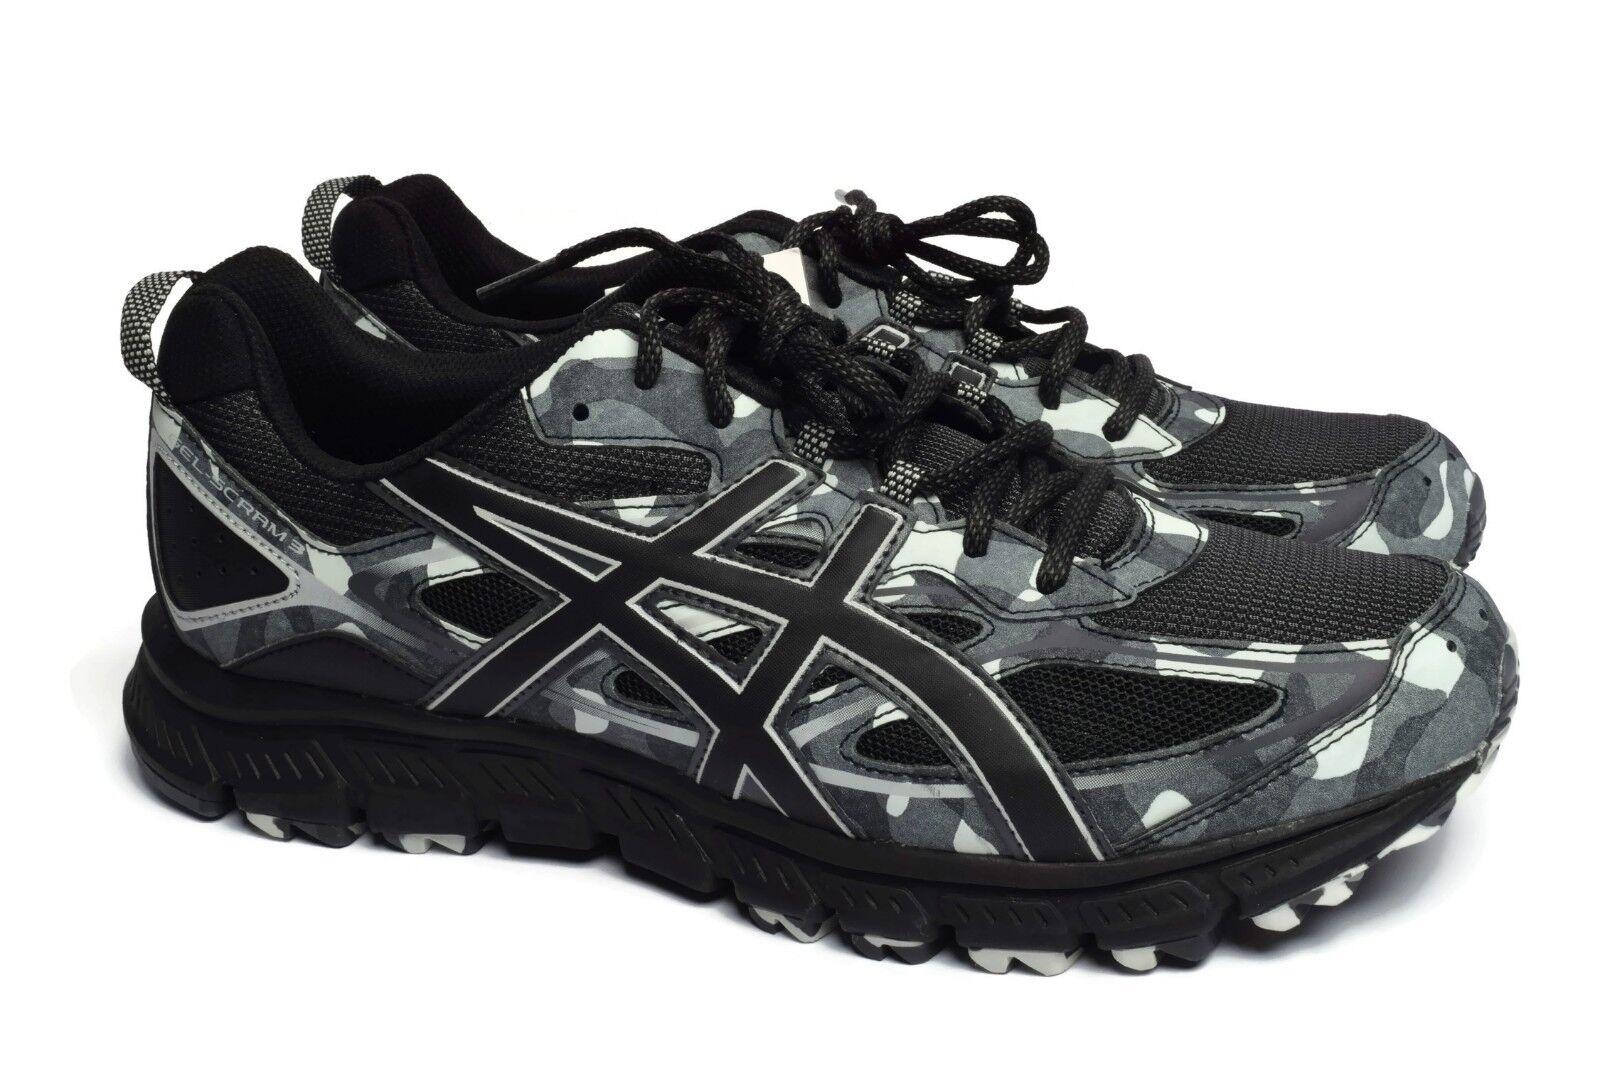 ASICS Homme Gel-Scram 3 Noir Gris Athletic Fitness Sport Running Chaussures Sz 9-13